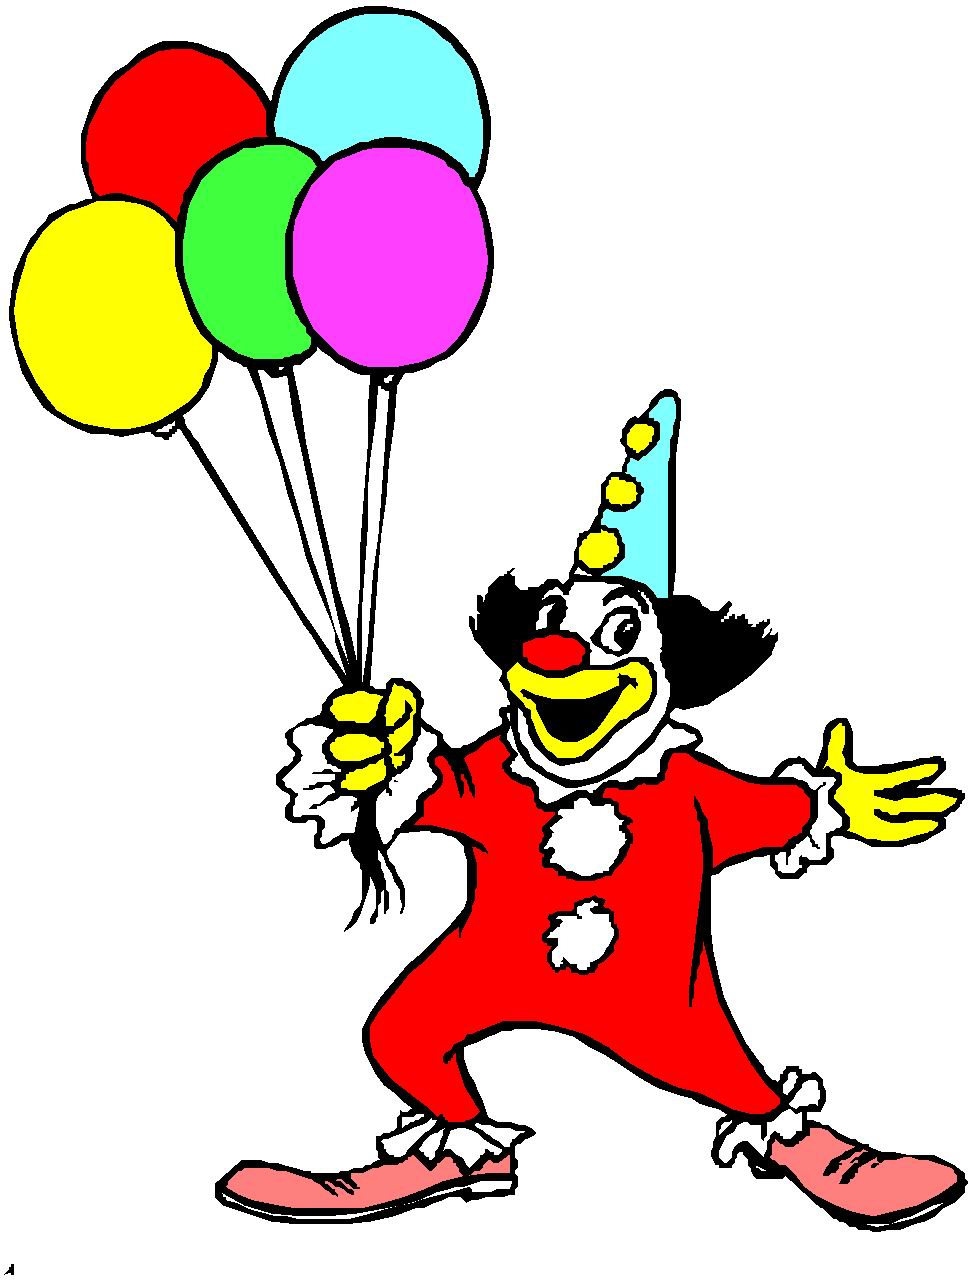 Joker clipart #15, Download drawings